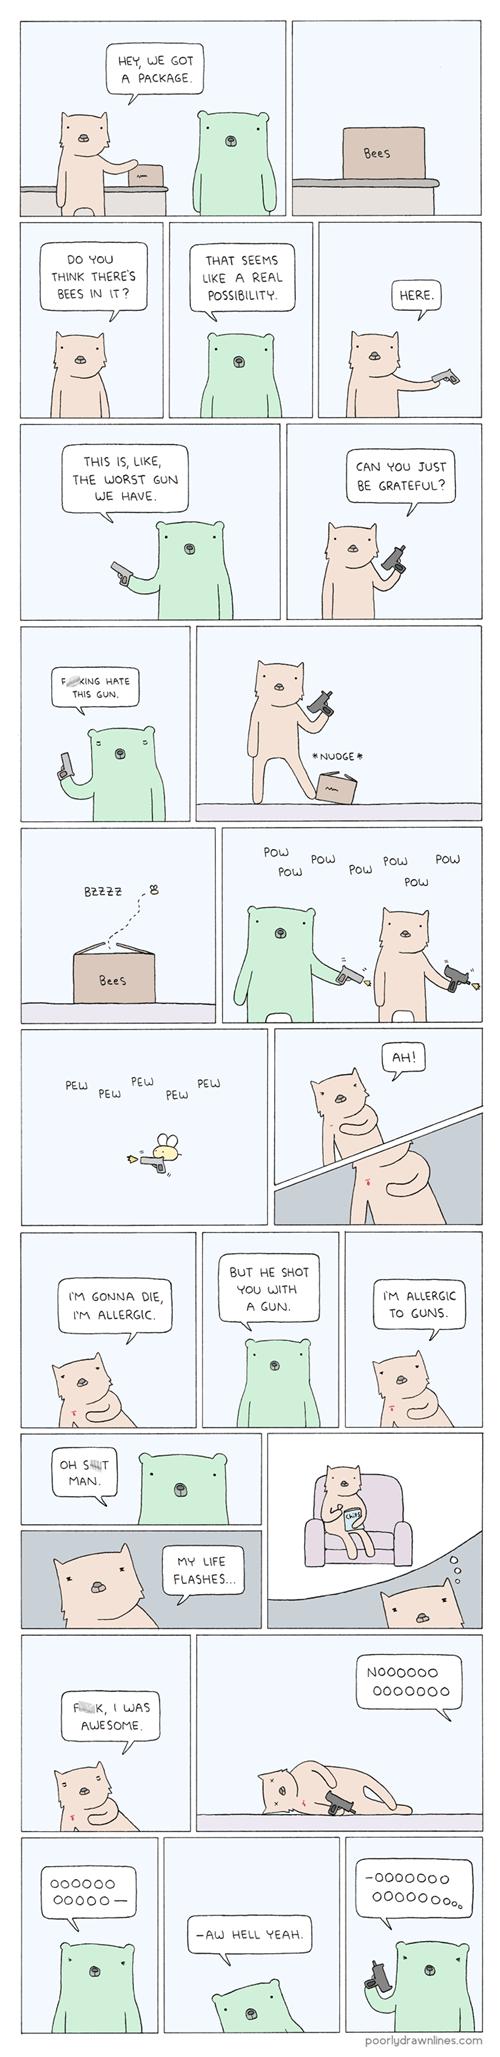 guns,bears,awesome,bees,web comics